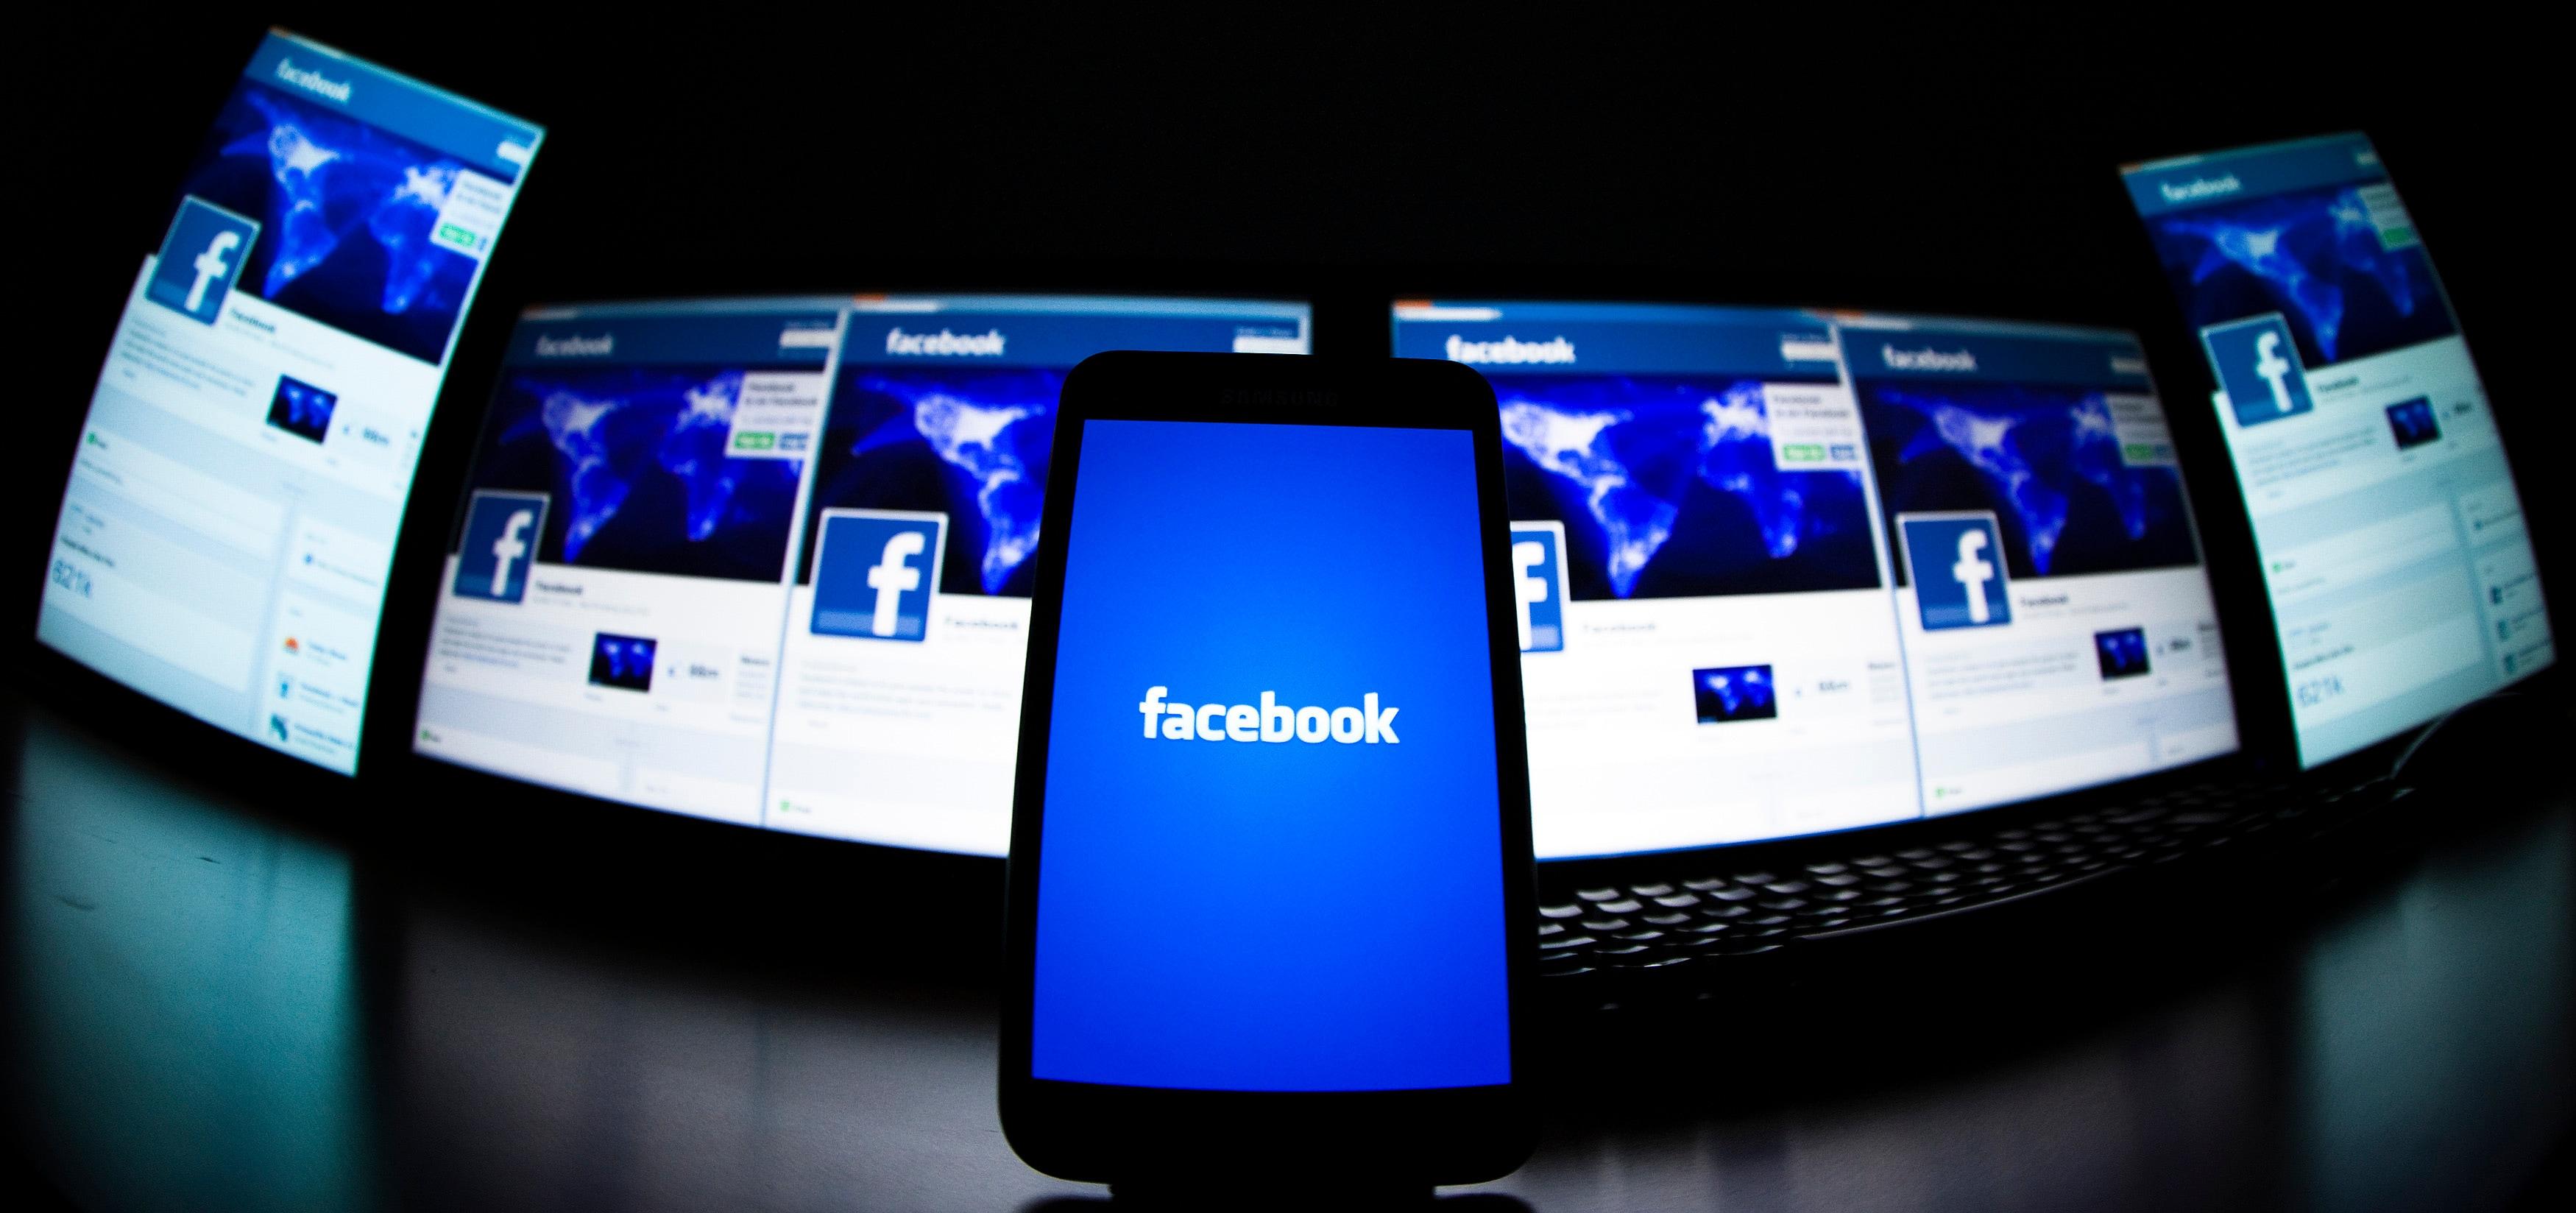 Facebook Sta Testando Un Nuovo Dialer Per Android